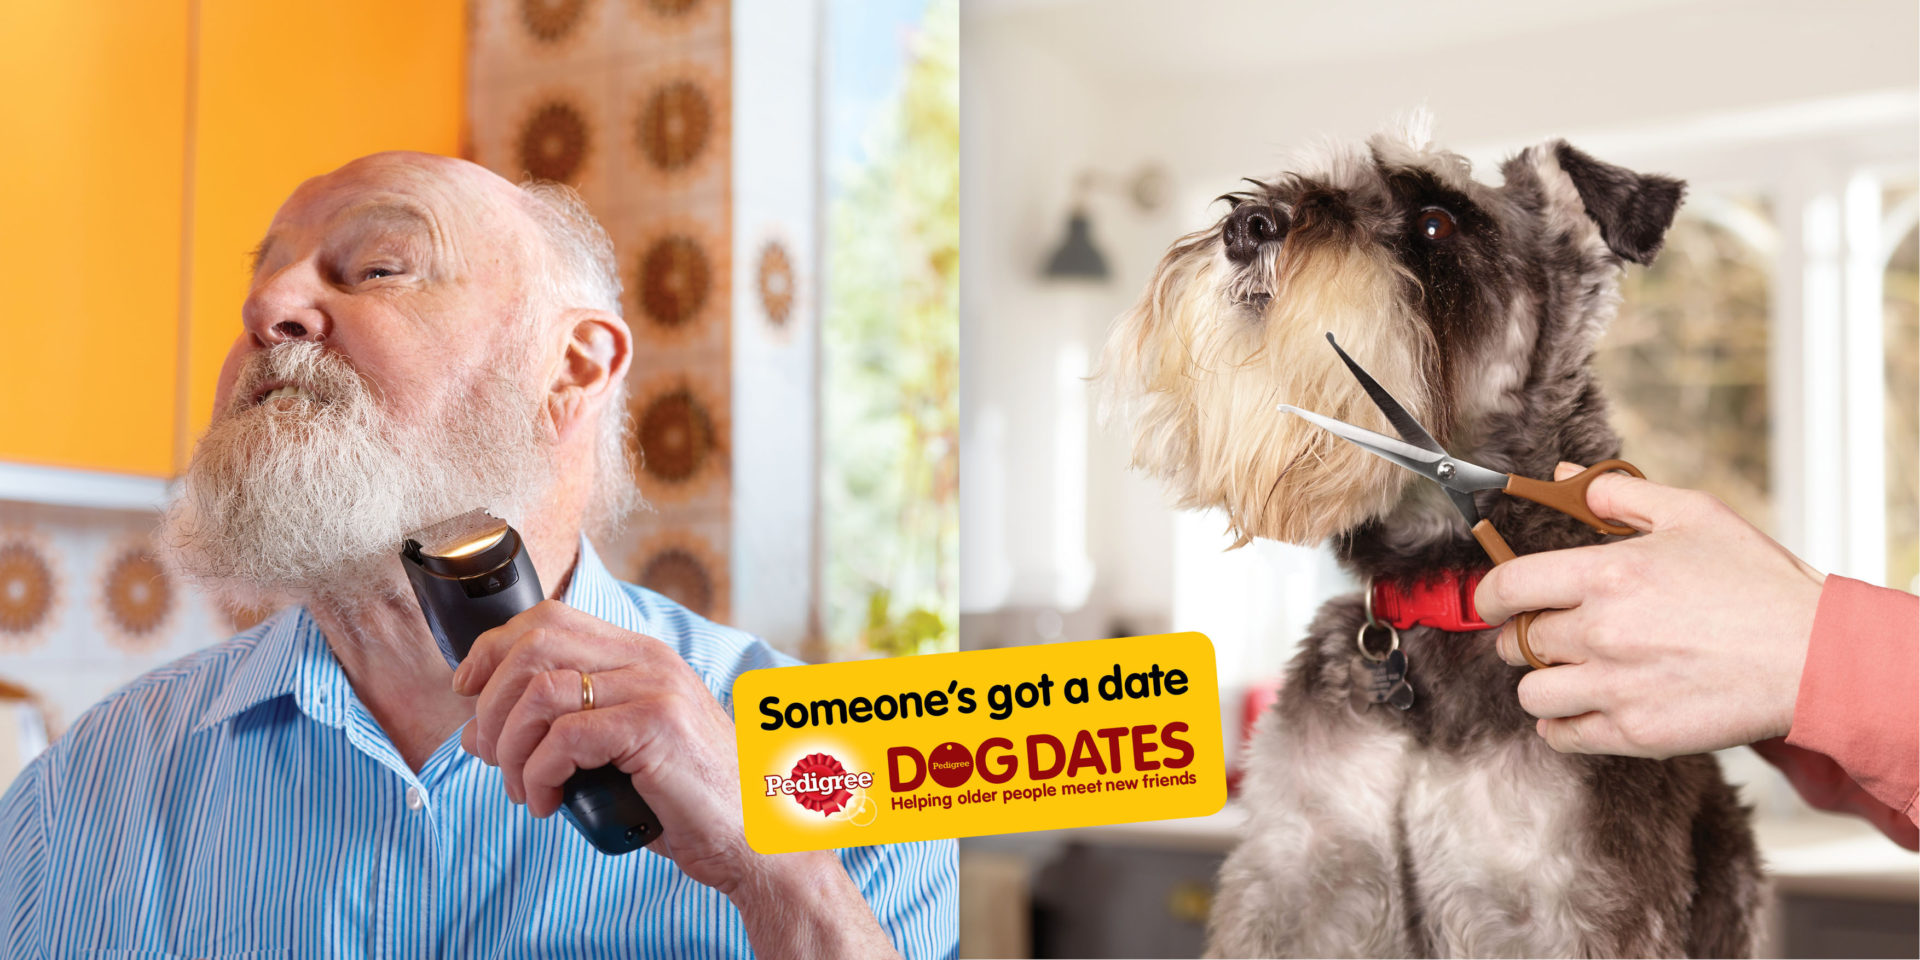 Shaw and Shaw Advertising Photographers – doggy dates Pedigree dog food AMVDDBO  Dog GroomingPedigree Dog Grooming poodle parlour